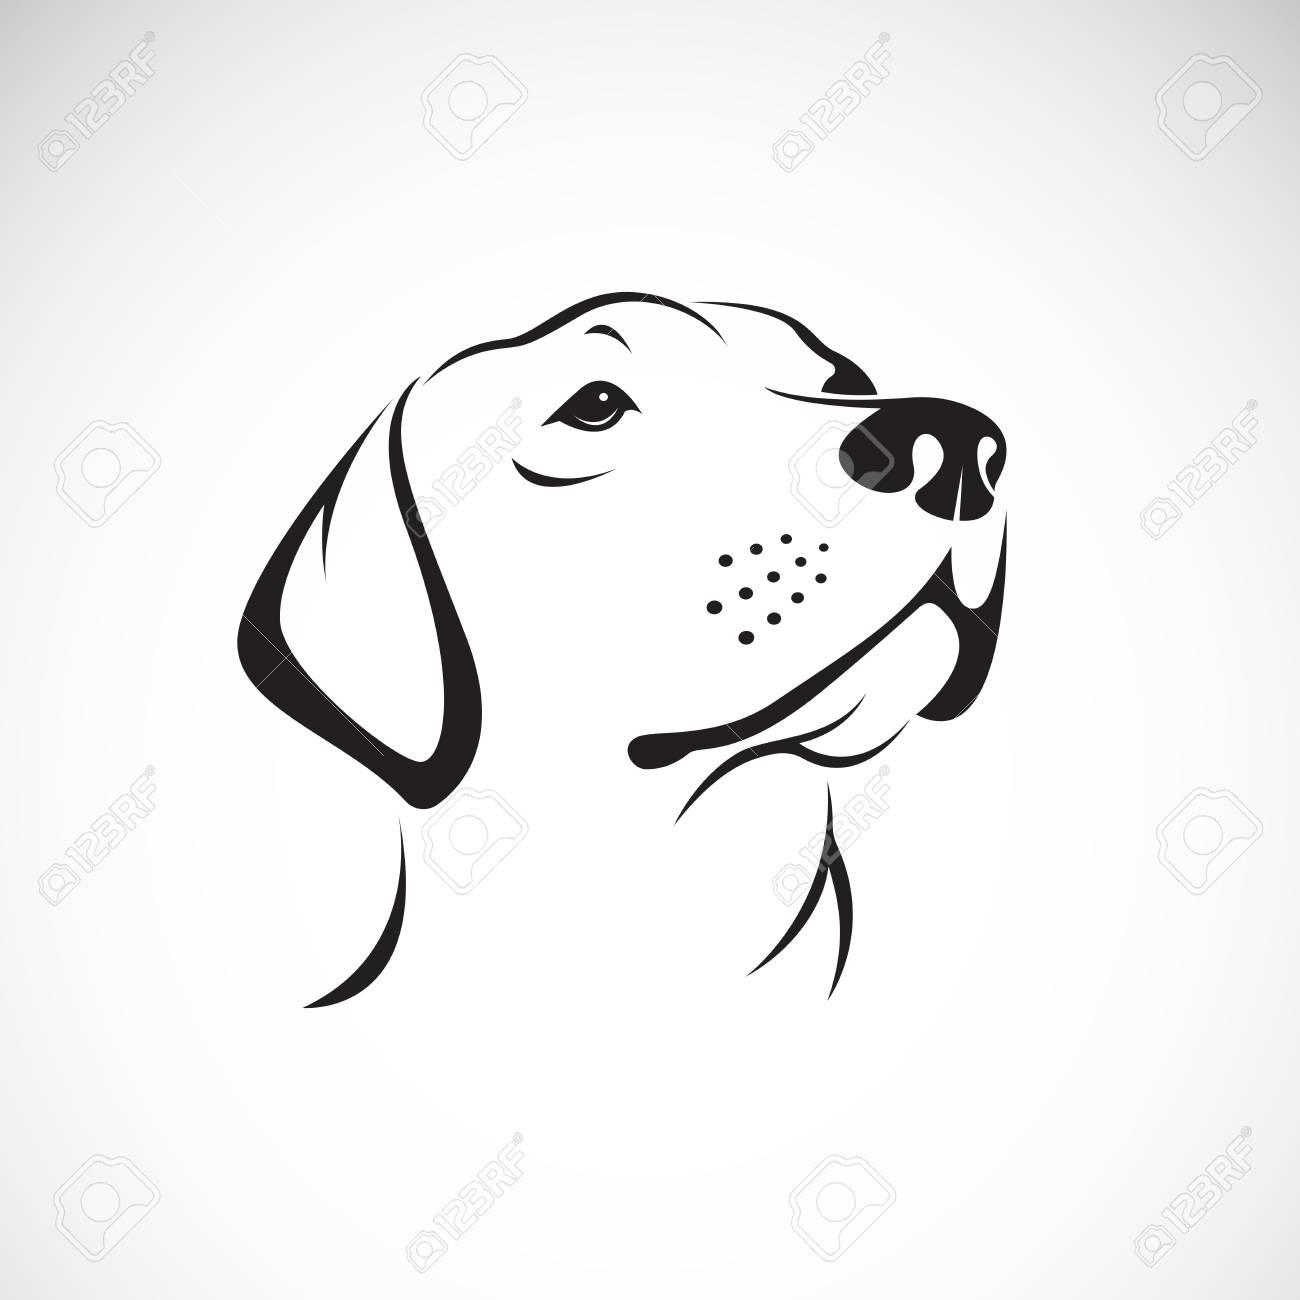 Vector of a dog head (Labrador Retriever) on white background - 91177129